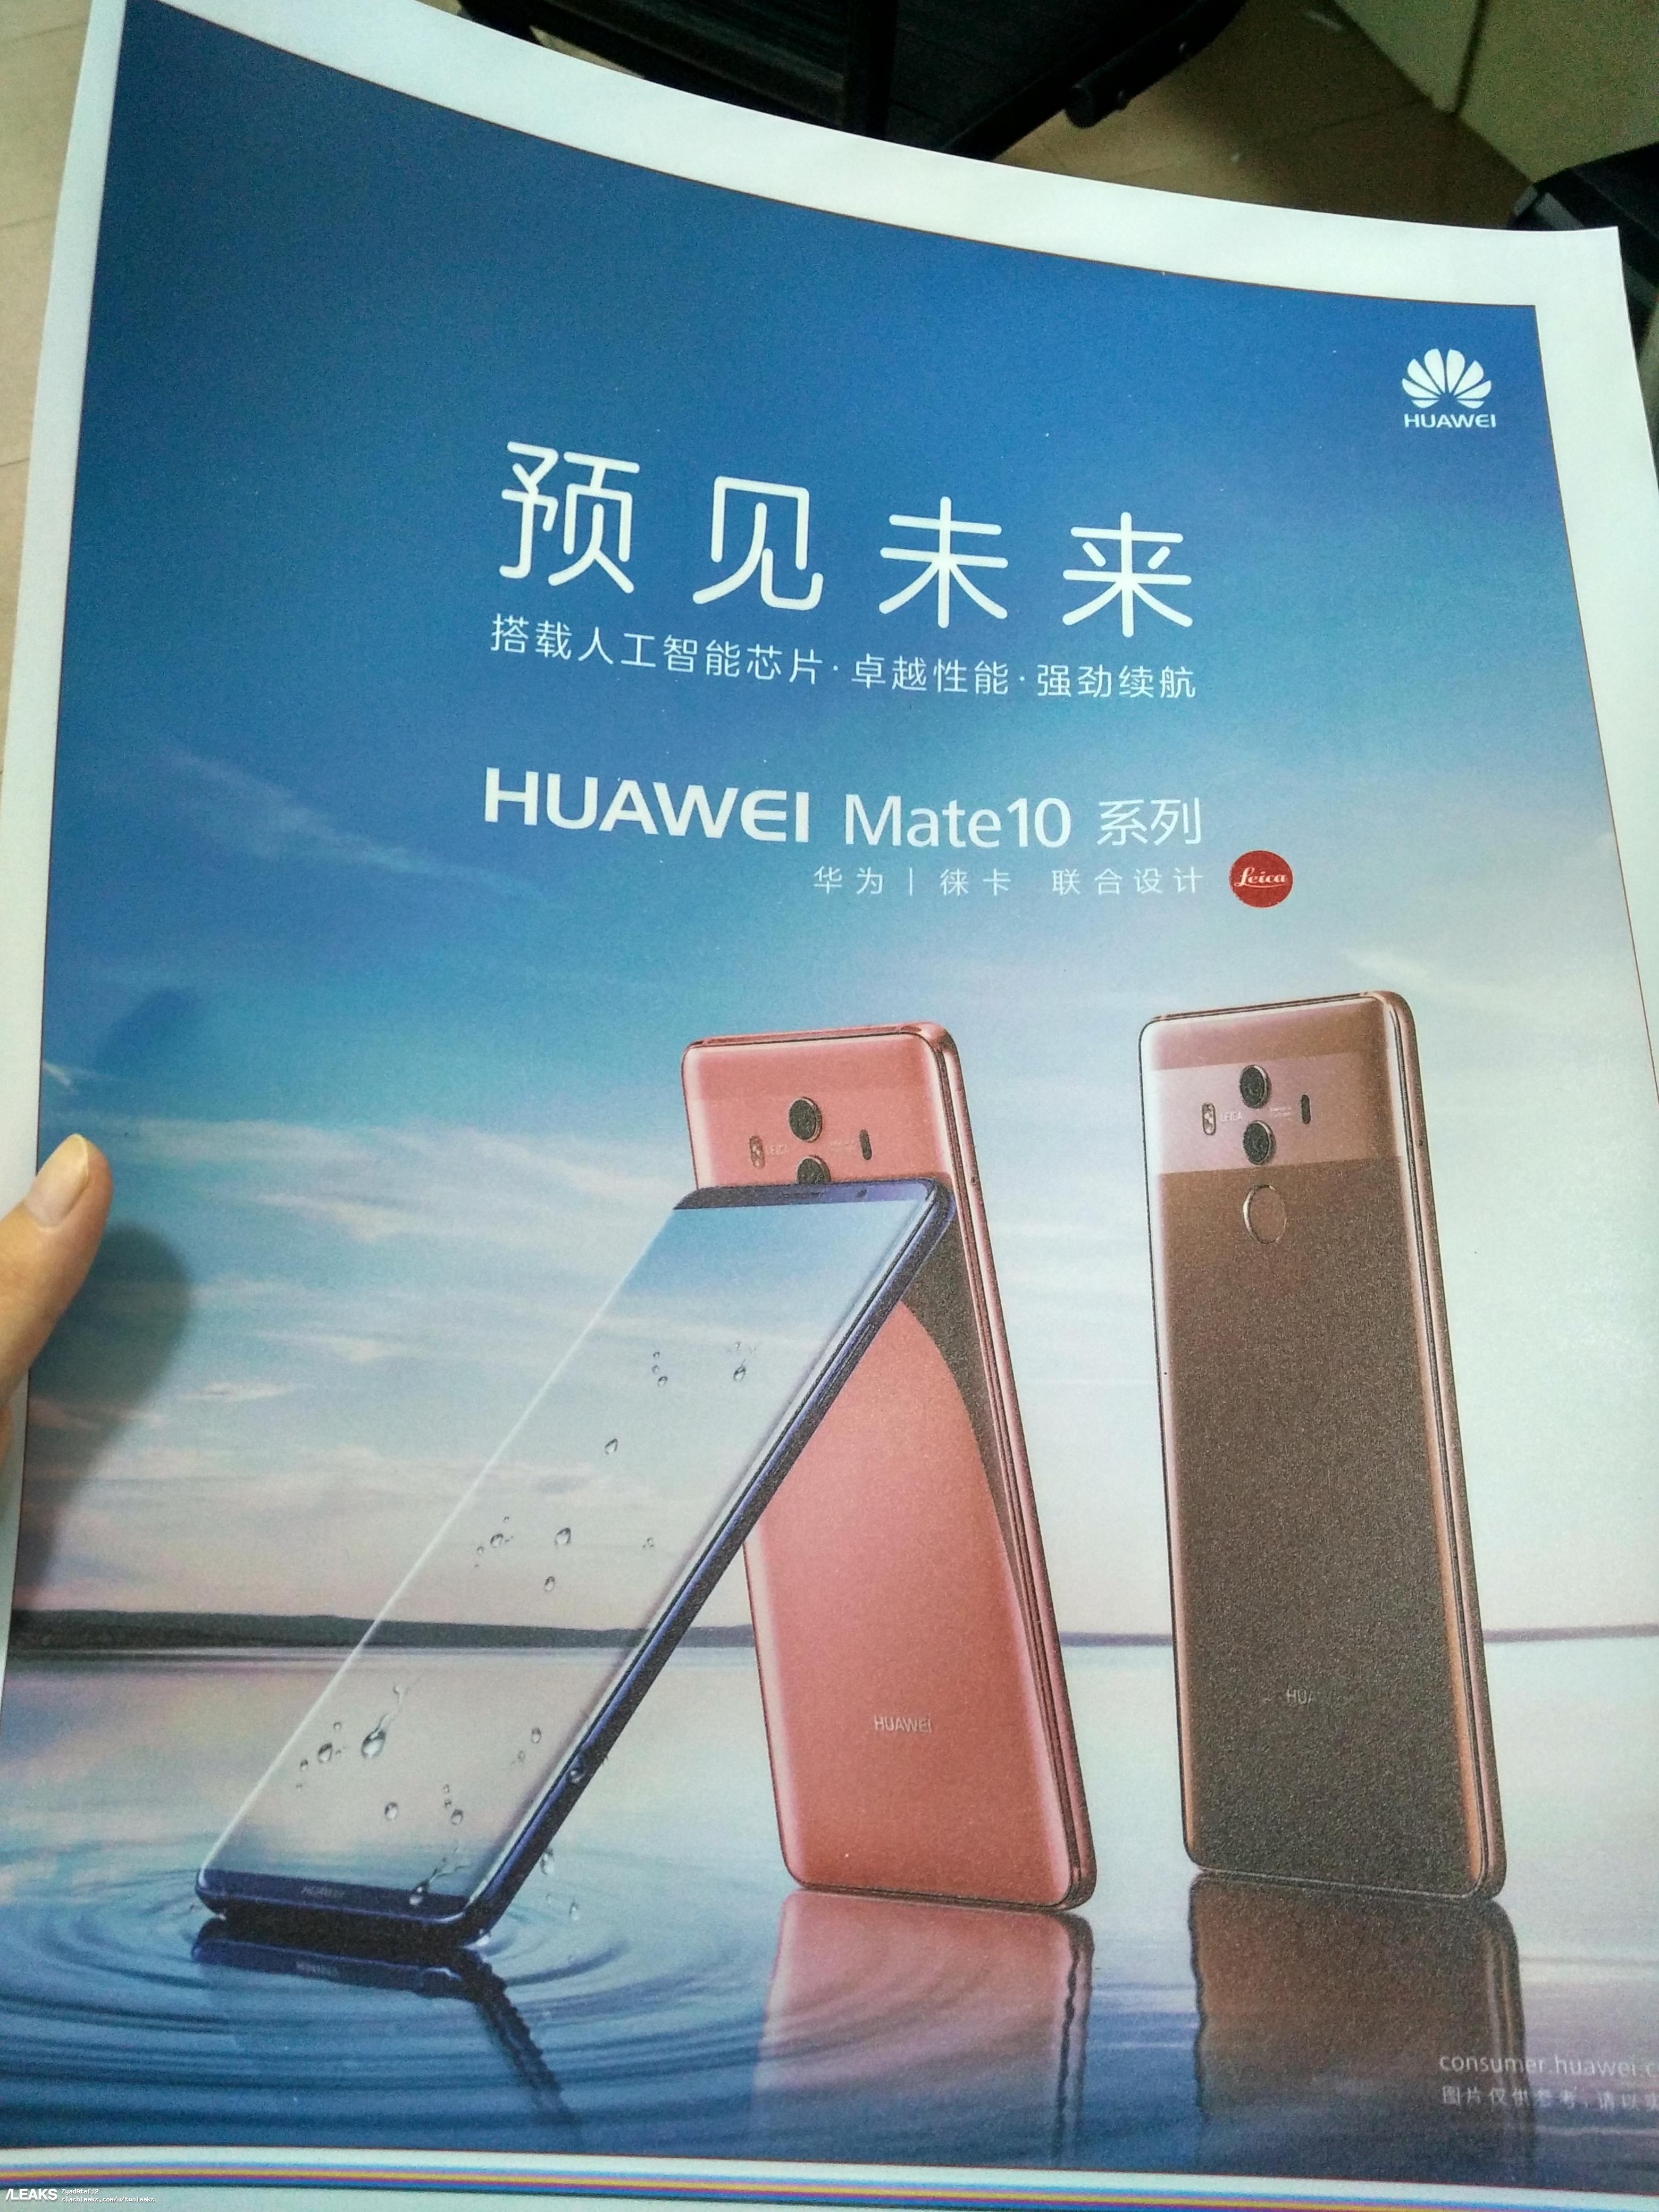 Huawei Mate 10 Pro poster